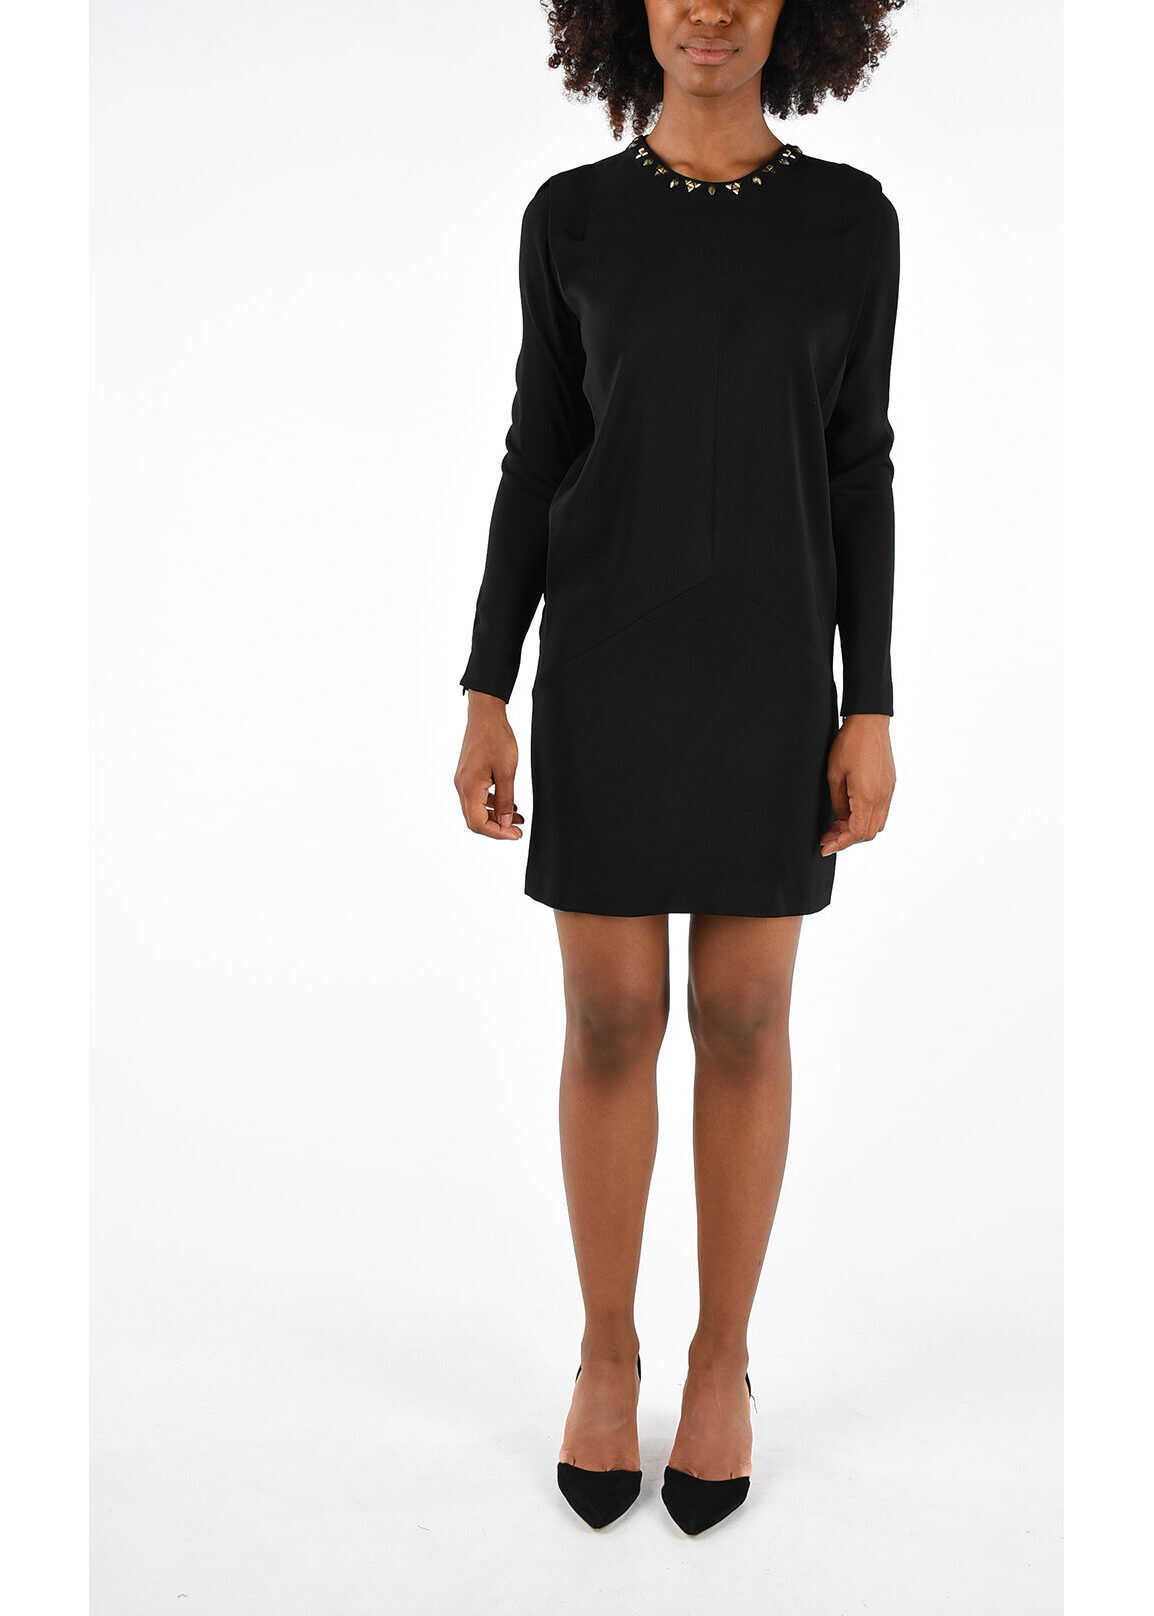 Just Cavalli Studded Shirt Dress BLACK